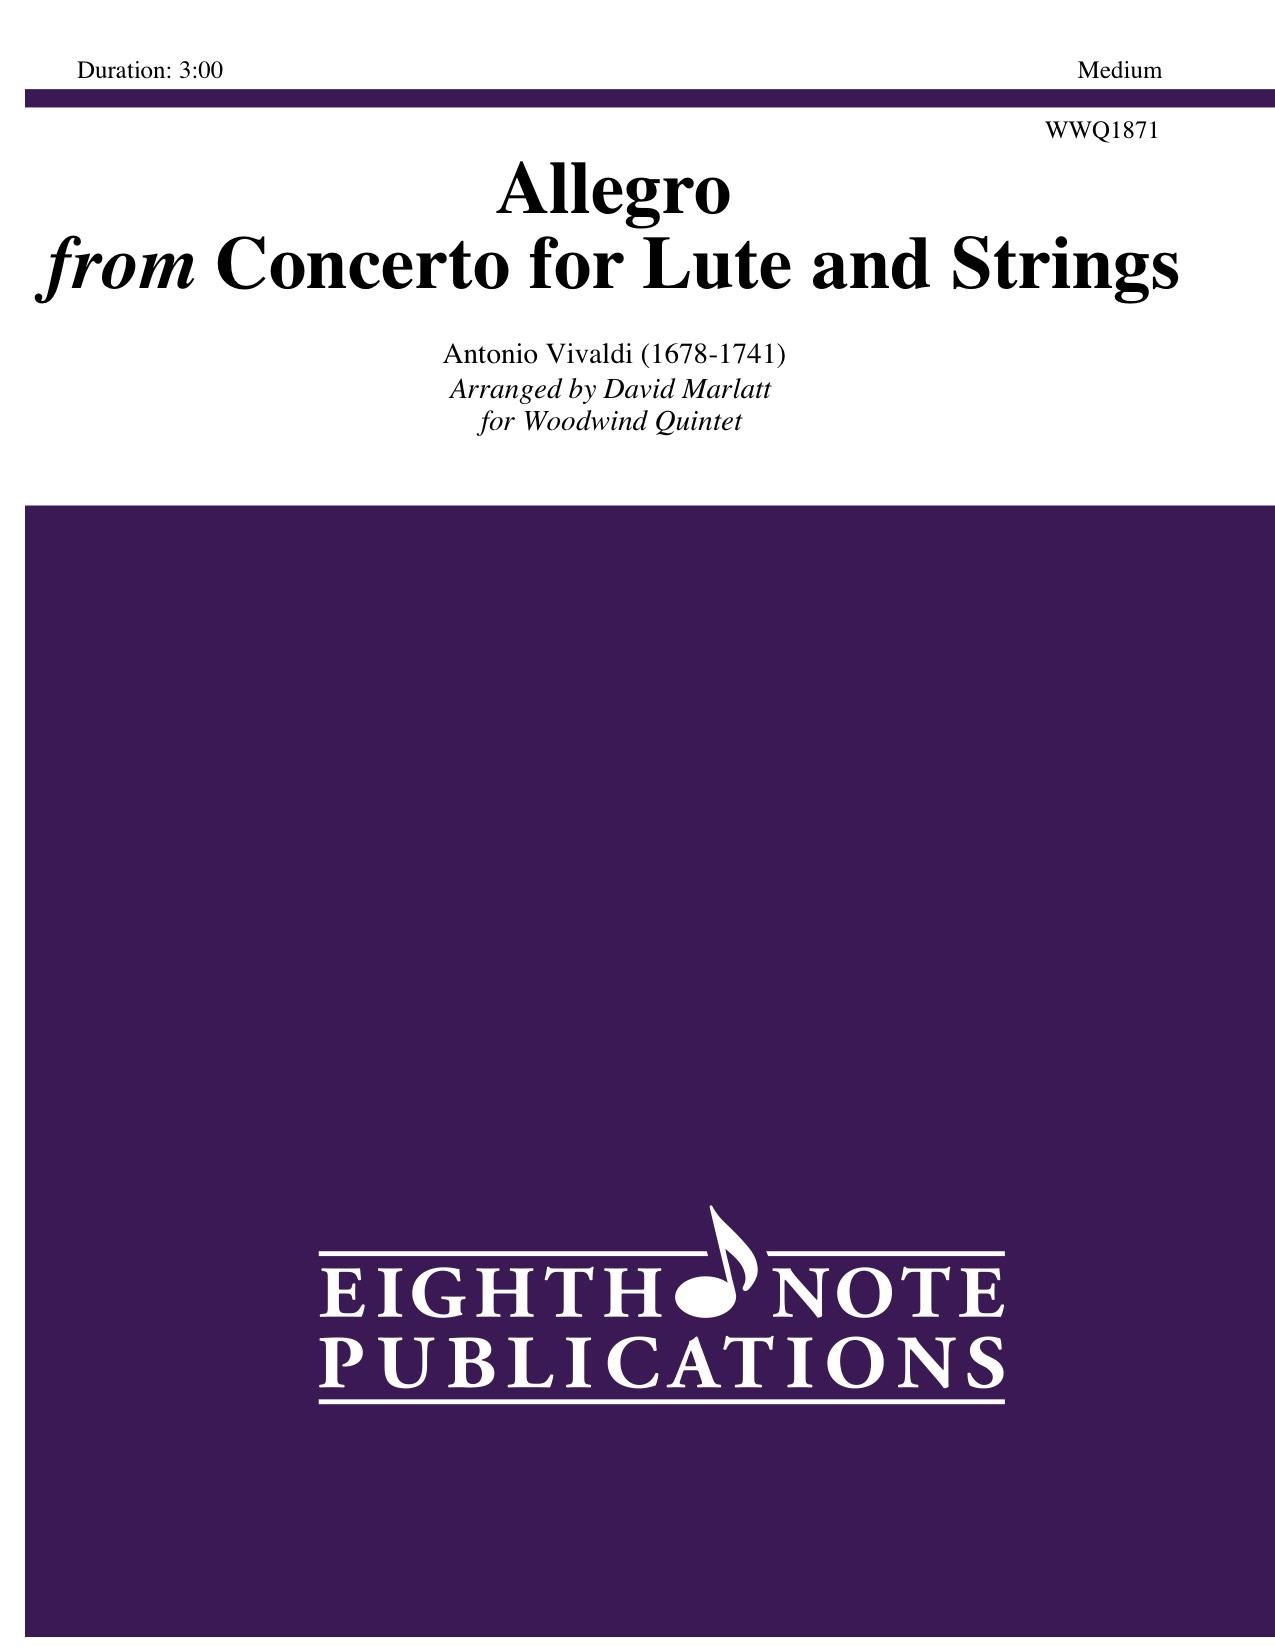 Allegro from Concerto for Lute and Strings - Antonio Vivaldi